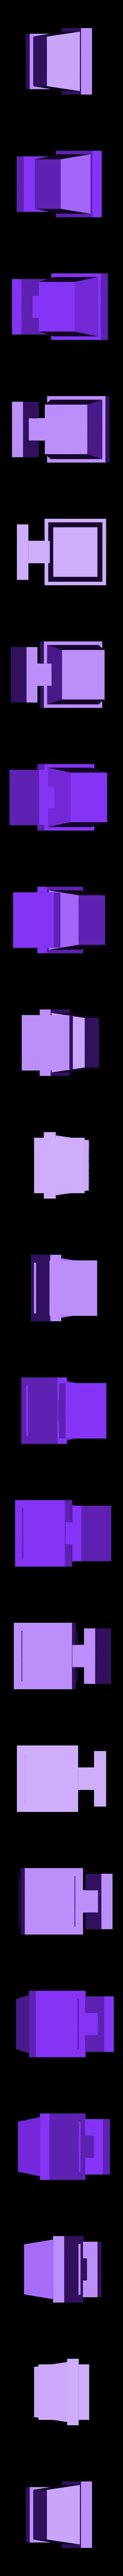 Ecran ordinateur type A.stl Download STL file Computer screen type A • 3D printable object, fanfy54